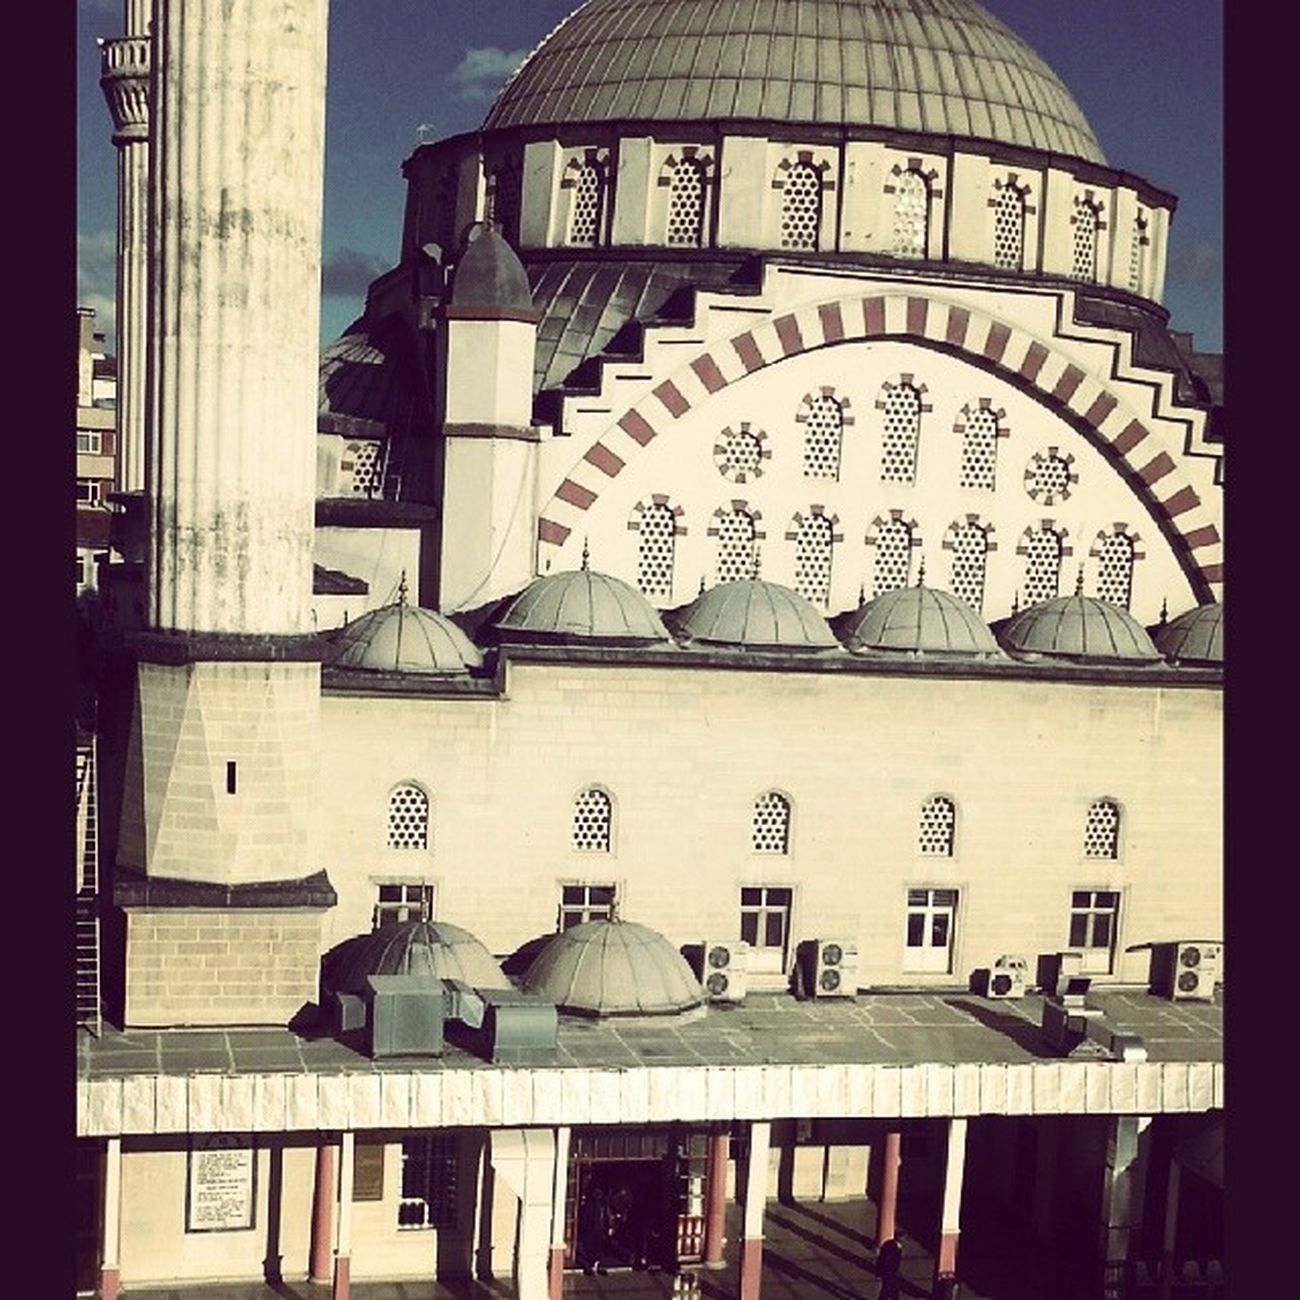 Kursumun manzarası en güzeli ♥ Izzetpasa Cami Elaz ığ Mosque objektifimden all_shots turkey instaturkey photooftheday pictureoftheday thebestphoto tagsforlikes like instalike ig_turkey instagram instaphoto